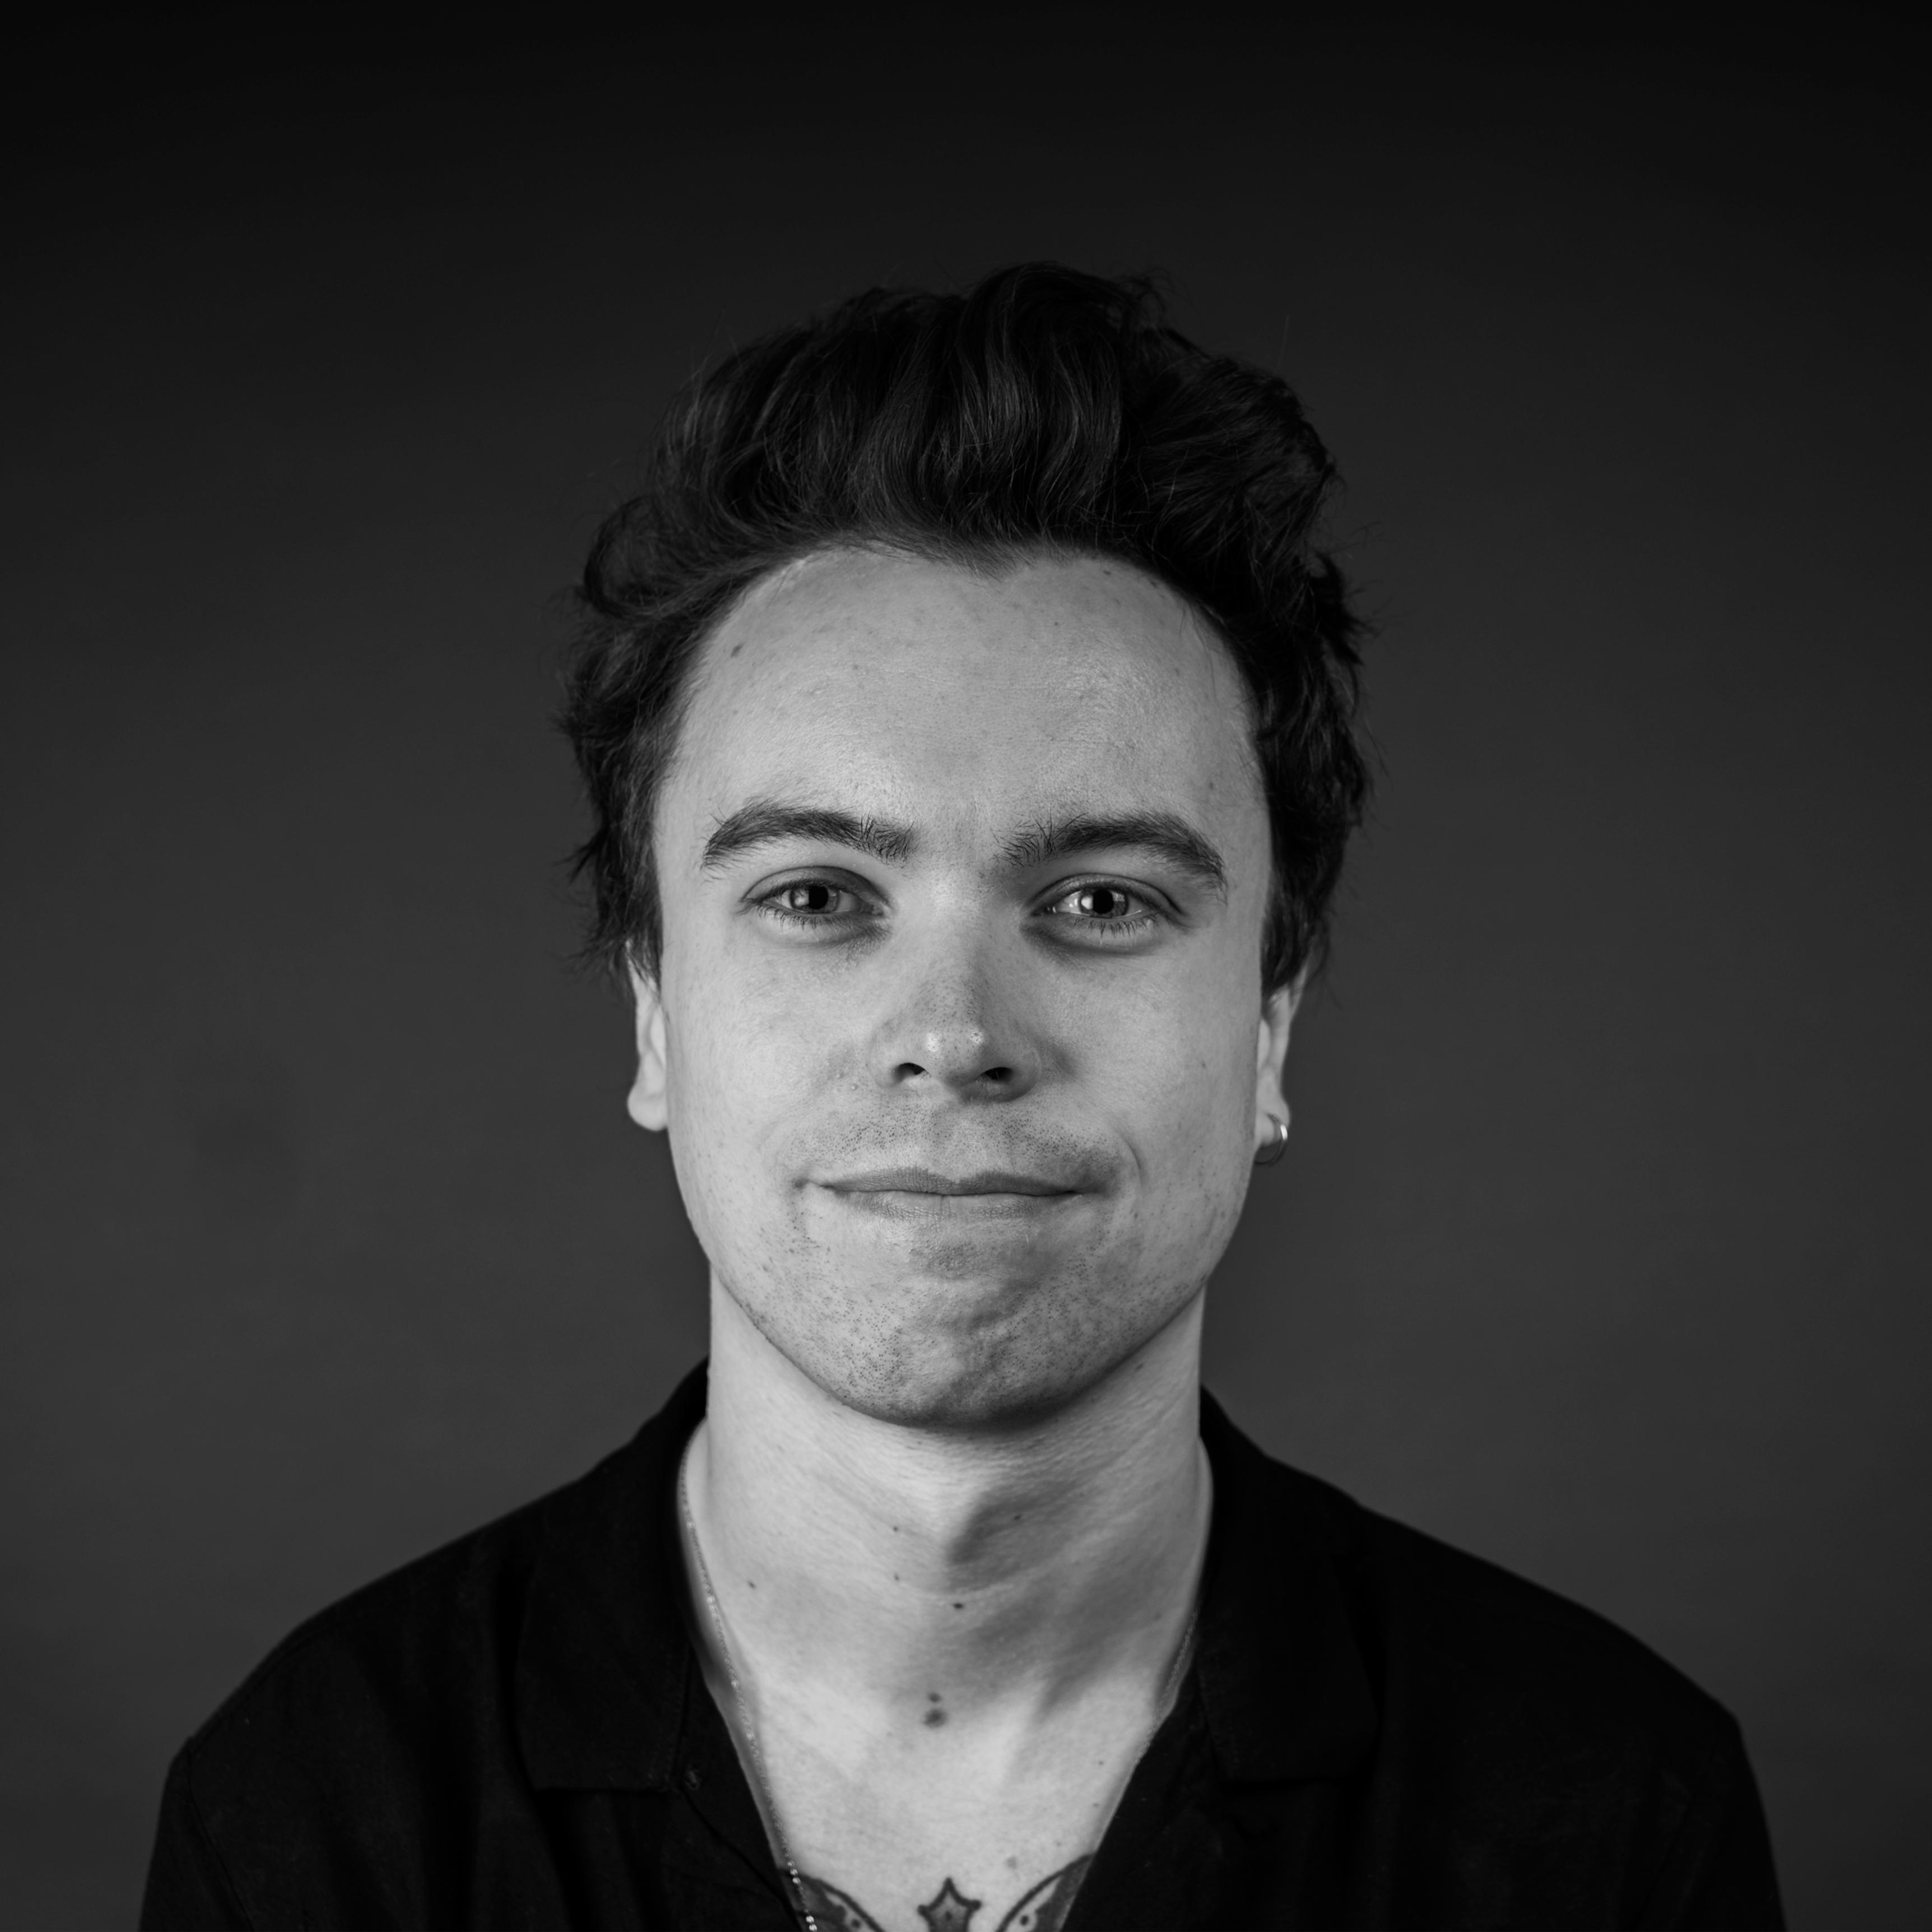 A member of the algorithm teams photo